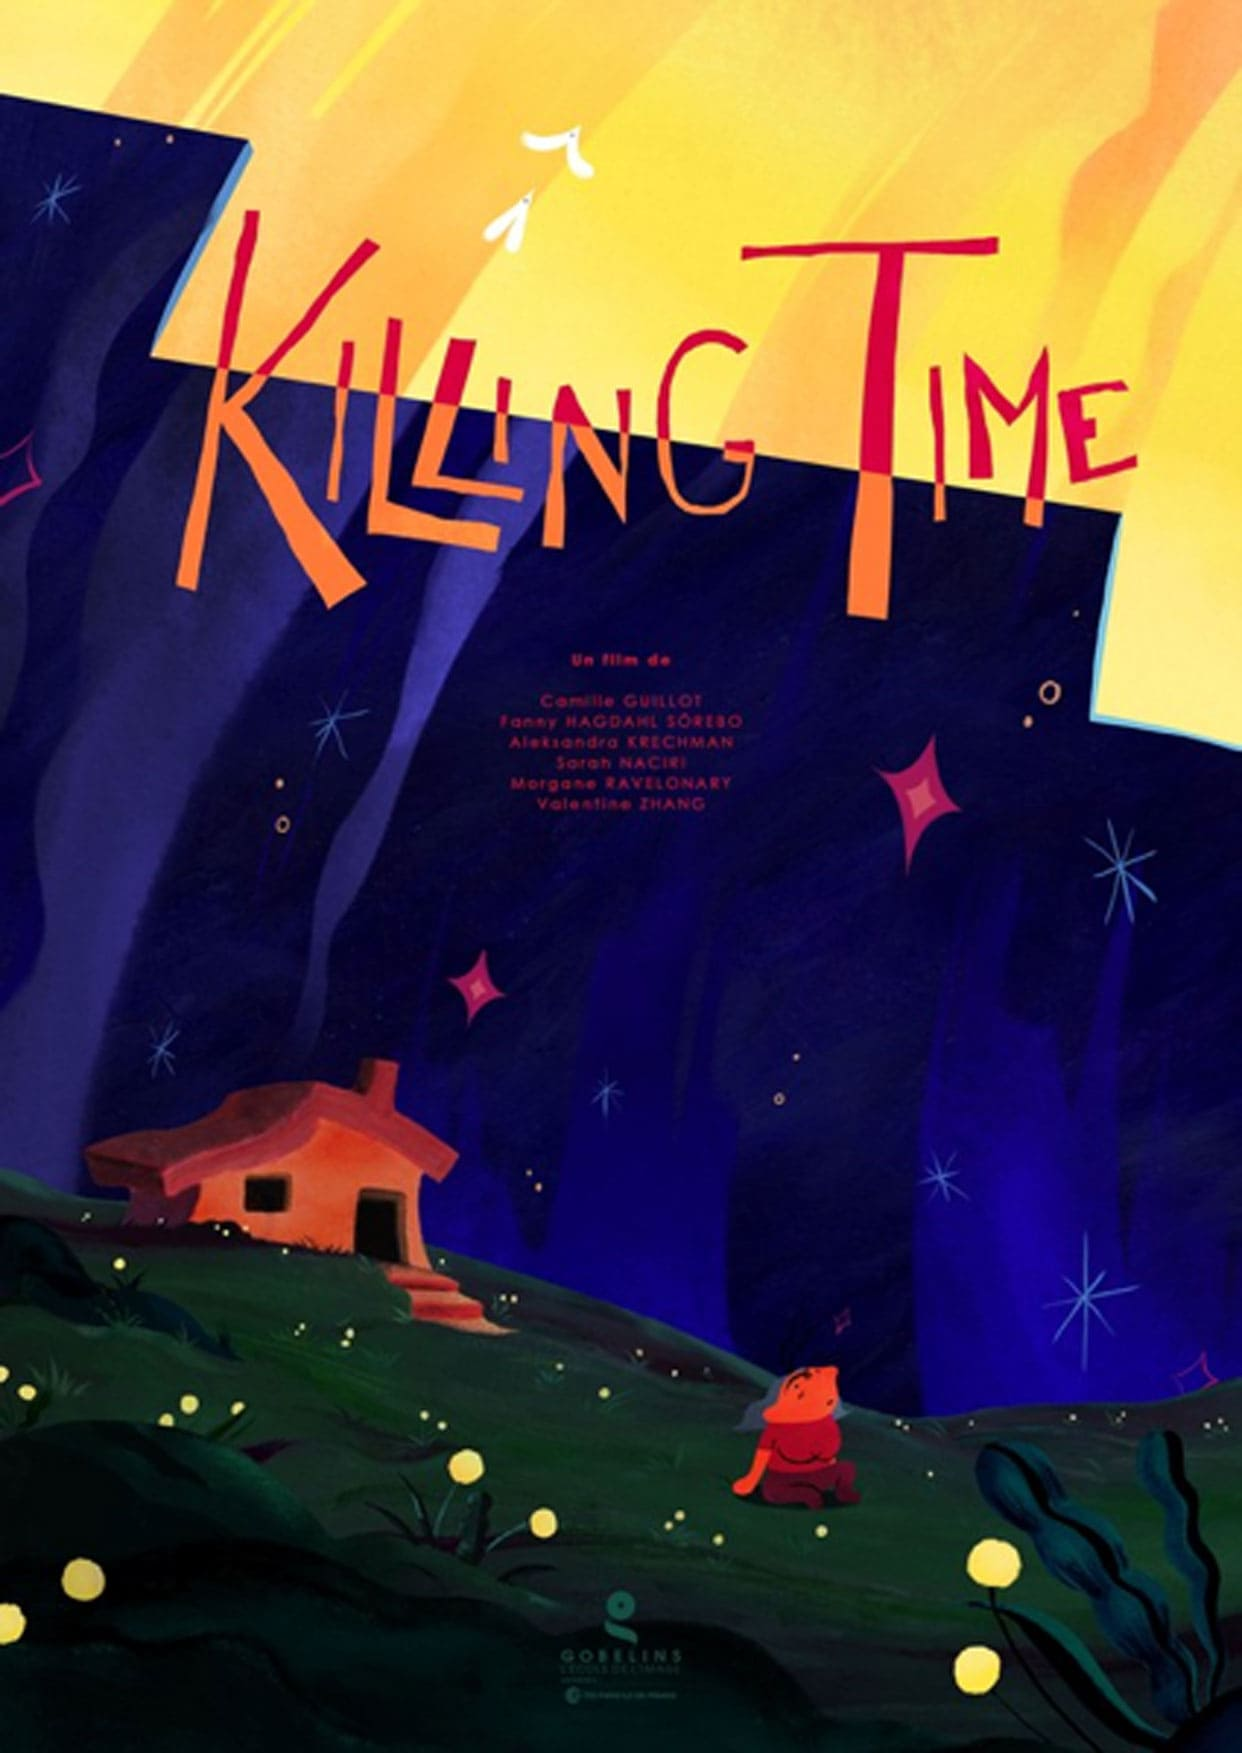 KILLING-TIME--GUILLOT-Camille-HAGDAHL-SOREBO-Fanny-KRECHMAN-Aleksandra-NACIRI-Sarah-RAVELONARY-Morgane-ZHANG-Valentine